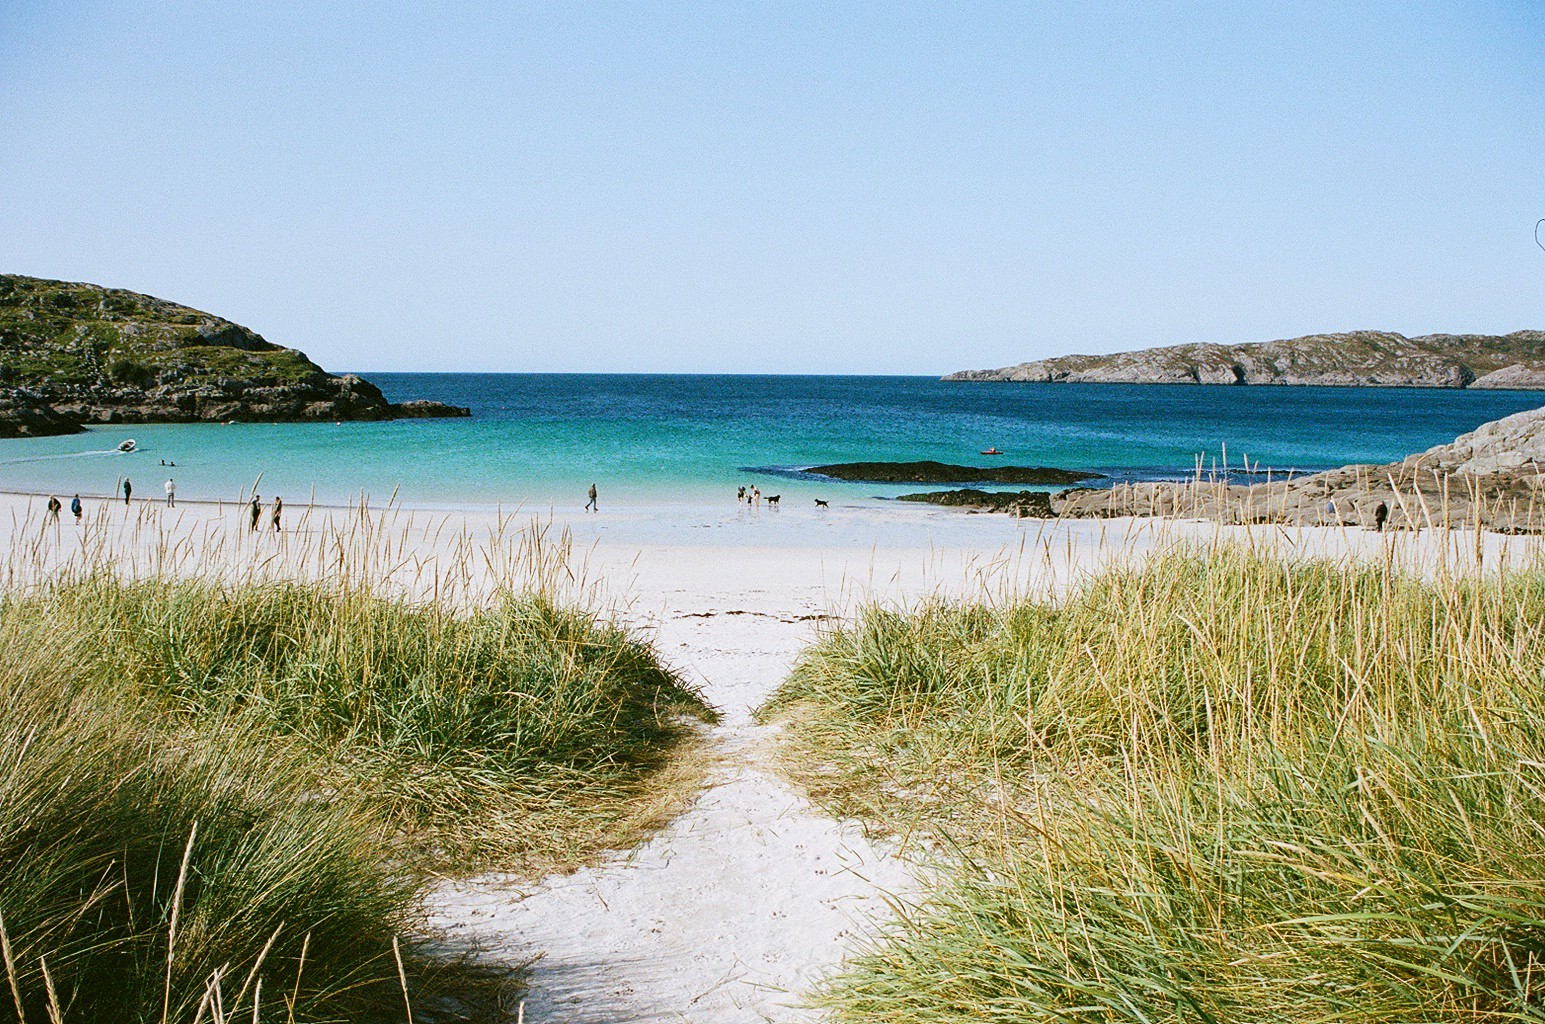 The Little Magpie Scotland Photo Diary North Coast 500 22